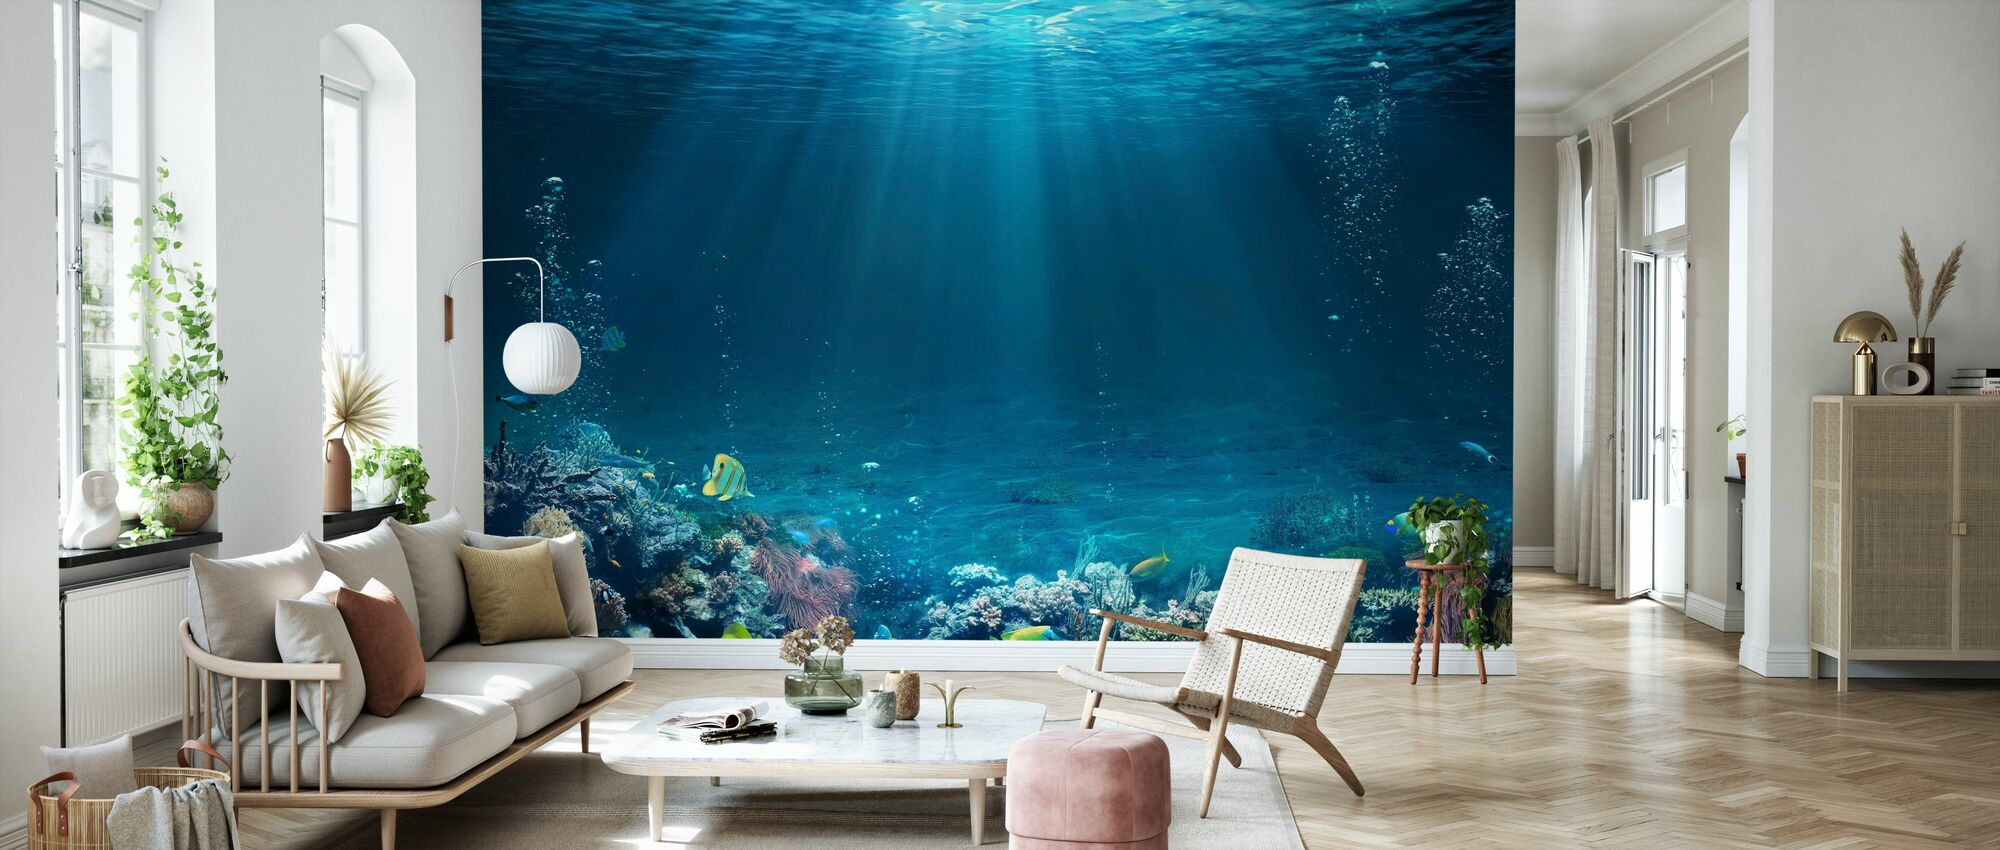 Underwater Scene - Wallpaper - Living Room